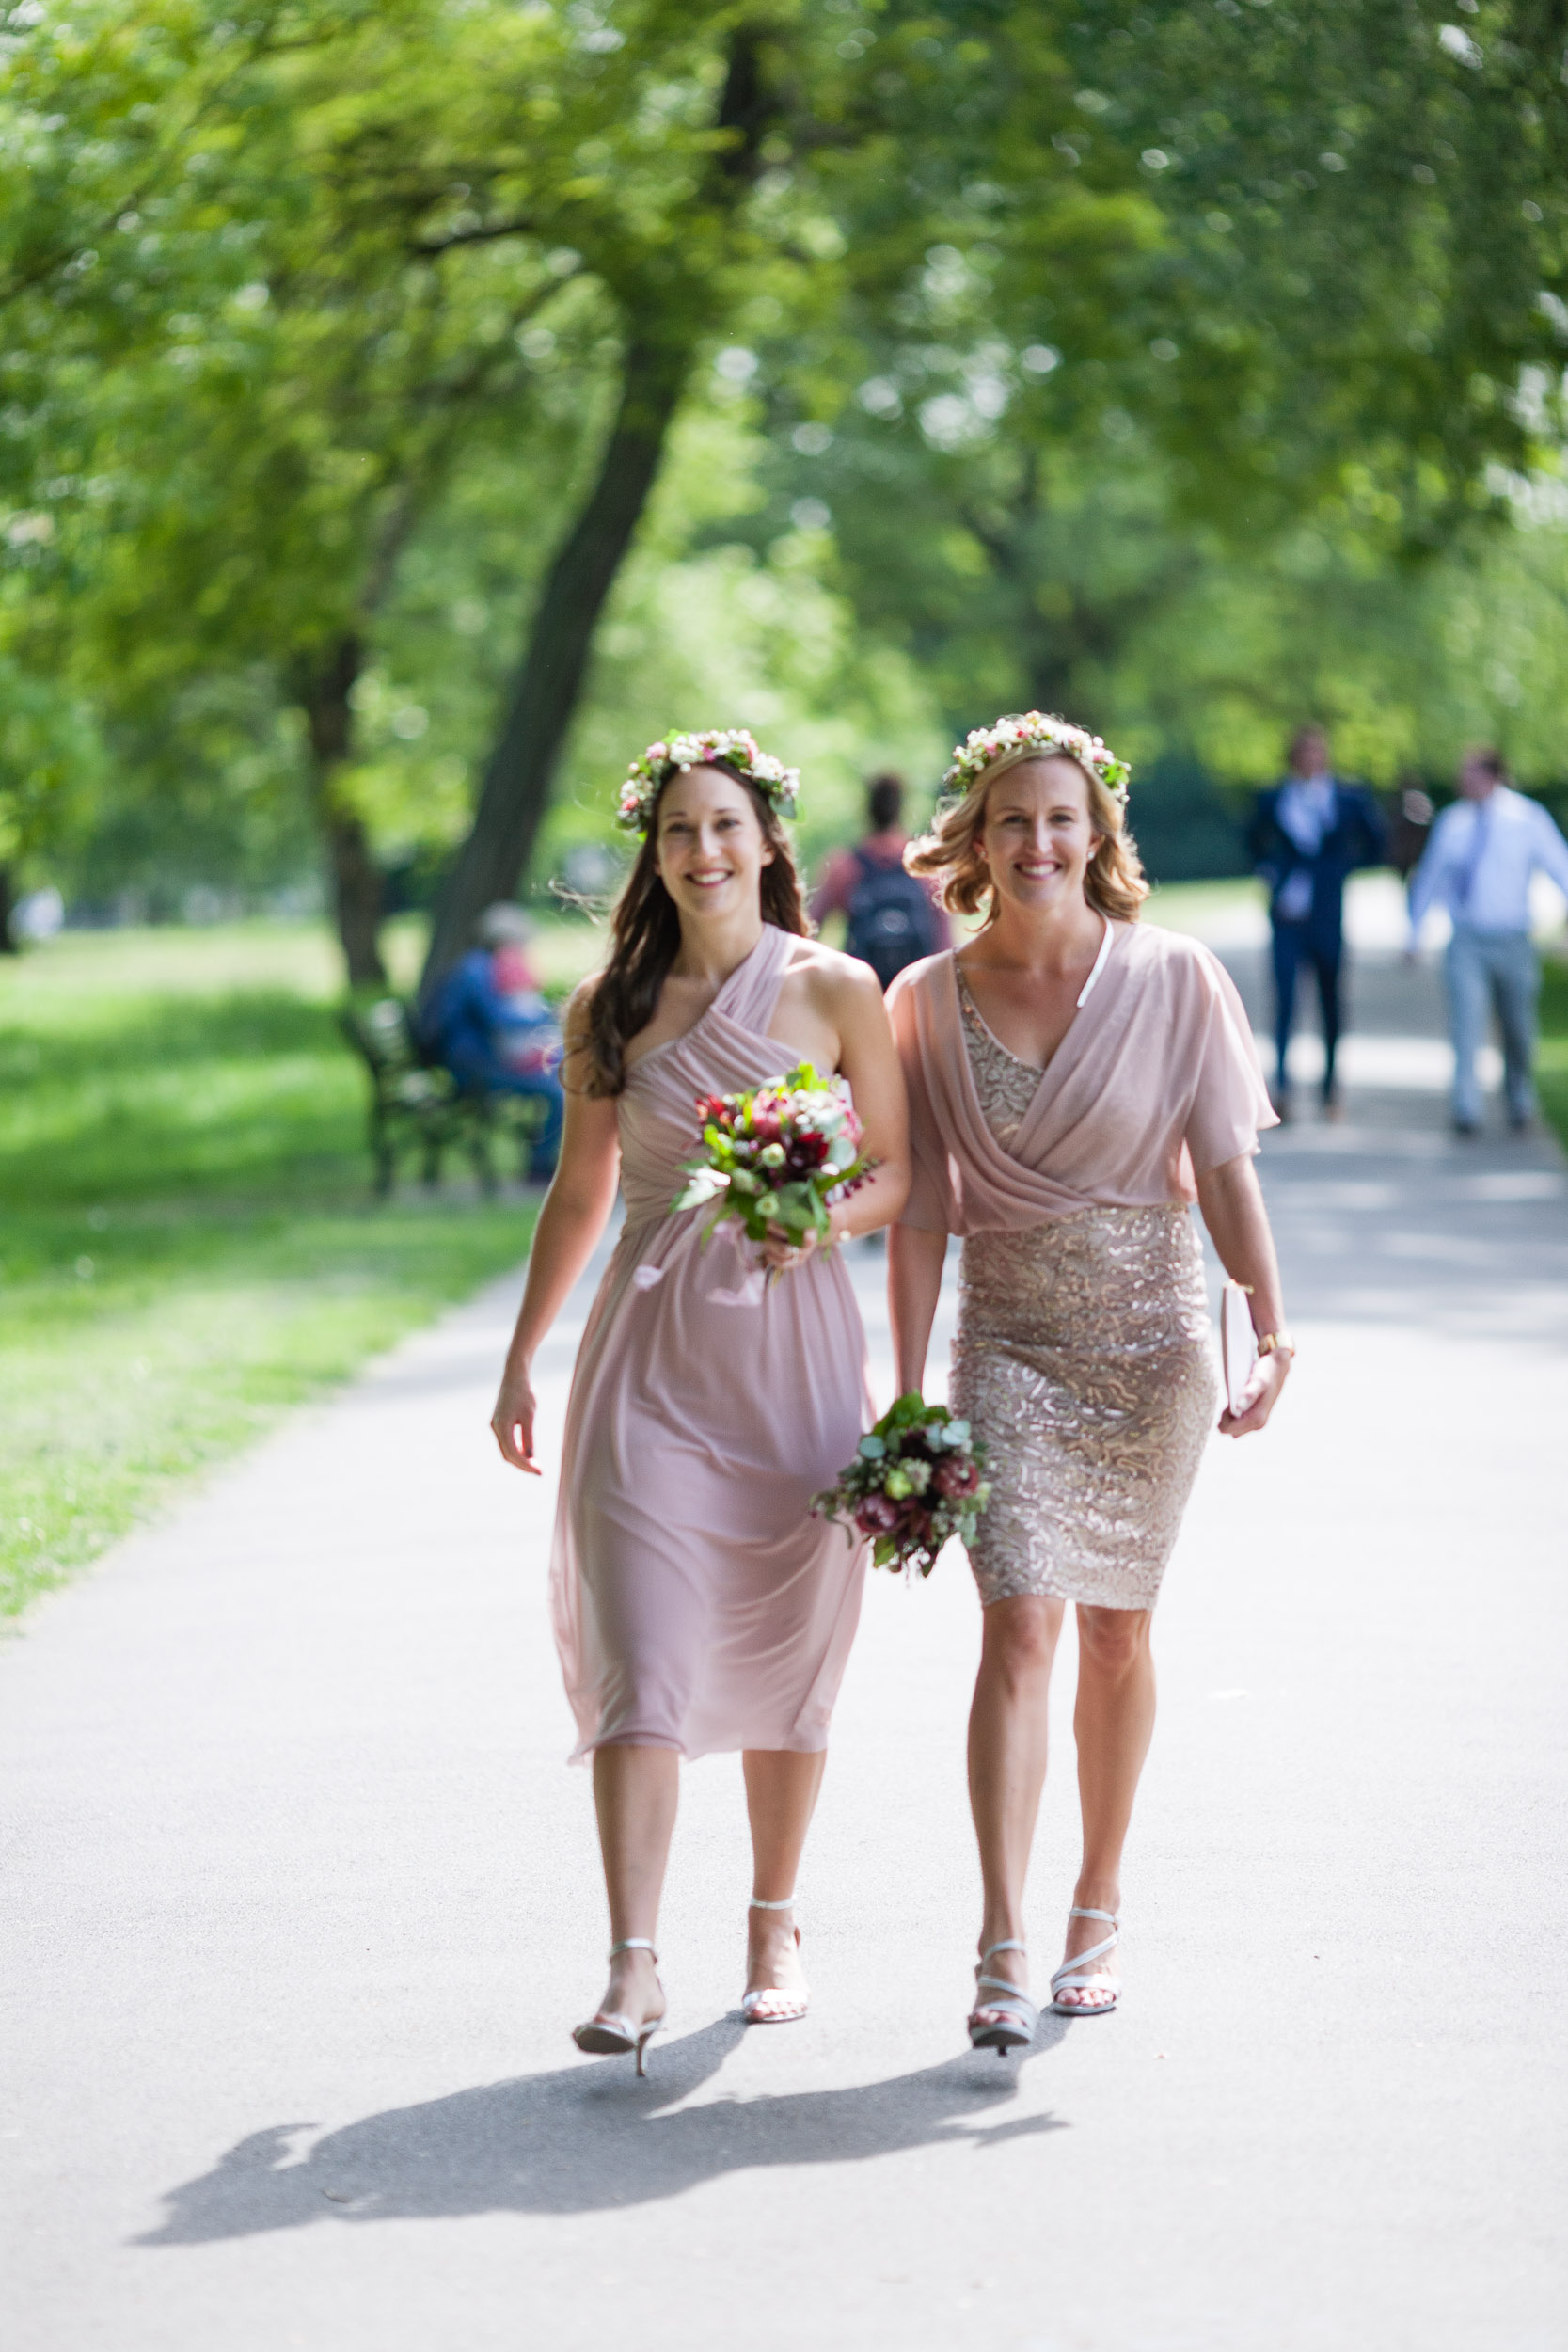 brockwell-lido-brixton-herne-hill-wedding-102.jpg